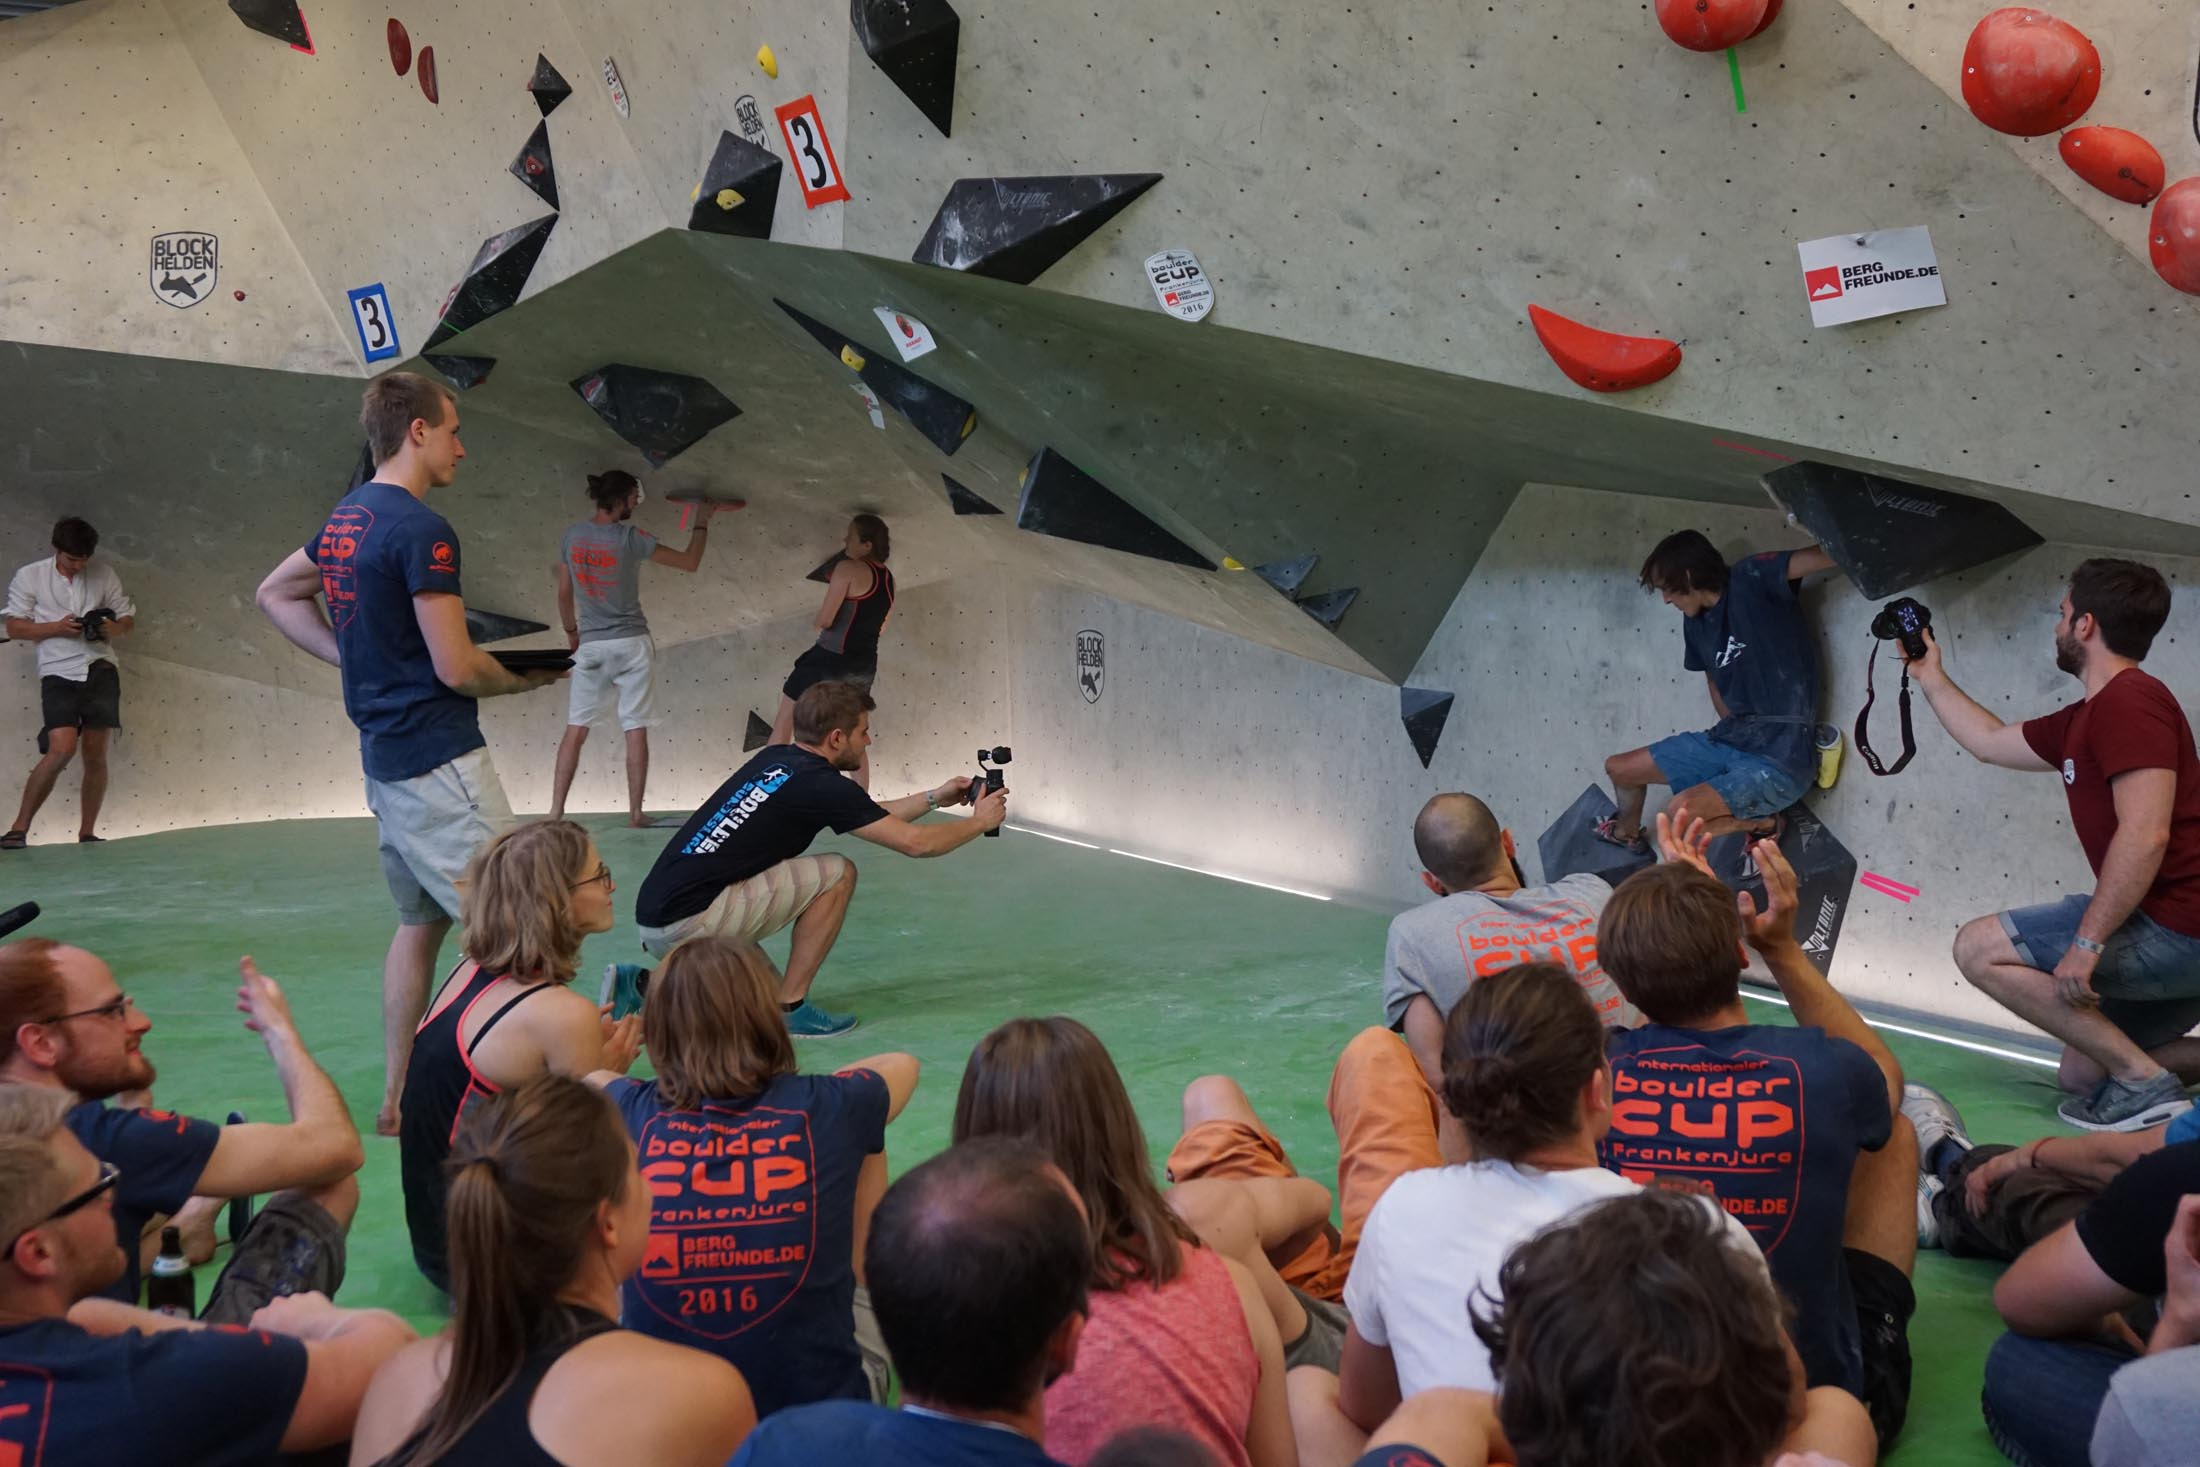 Finale, internationaler bouldercup Frankenjura 2016, BLOCKHELDEN Erlangen, Mammut, Bergfreunde.de, Boulderwettkampf07092016706